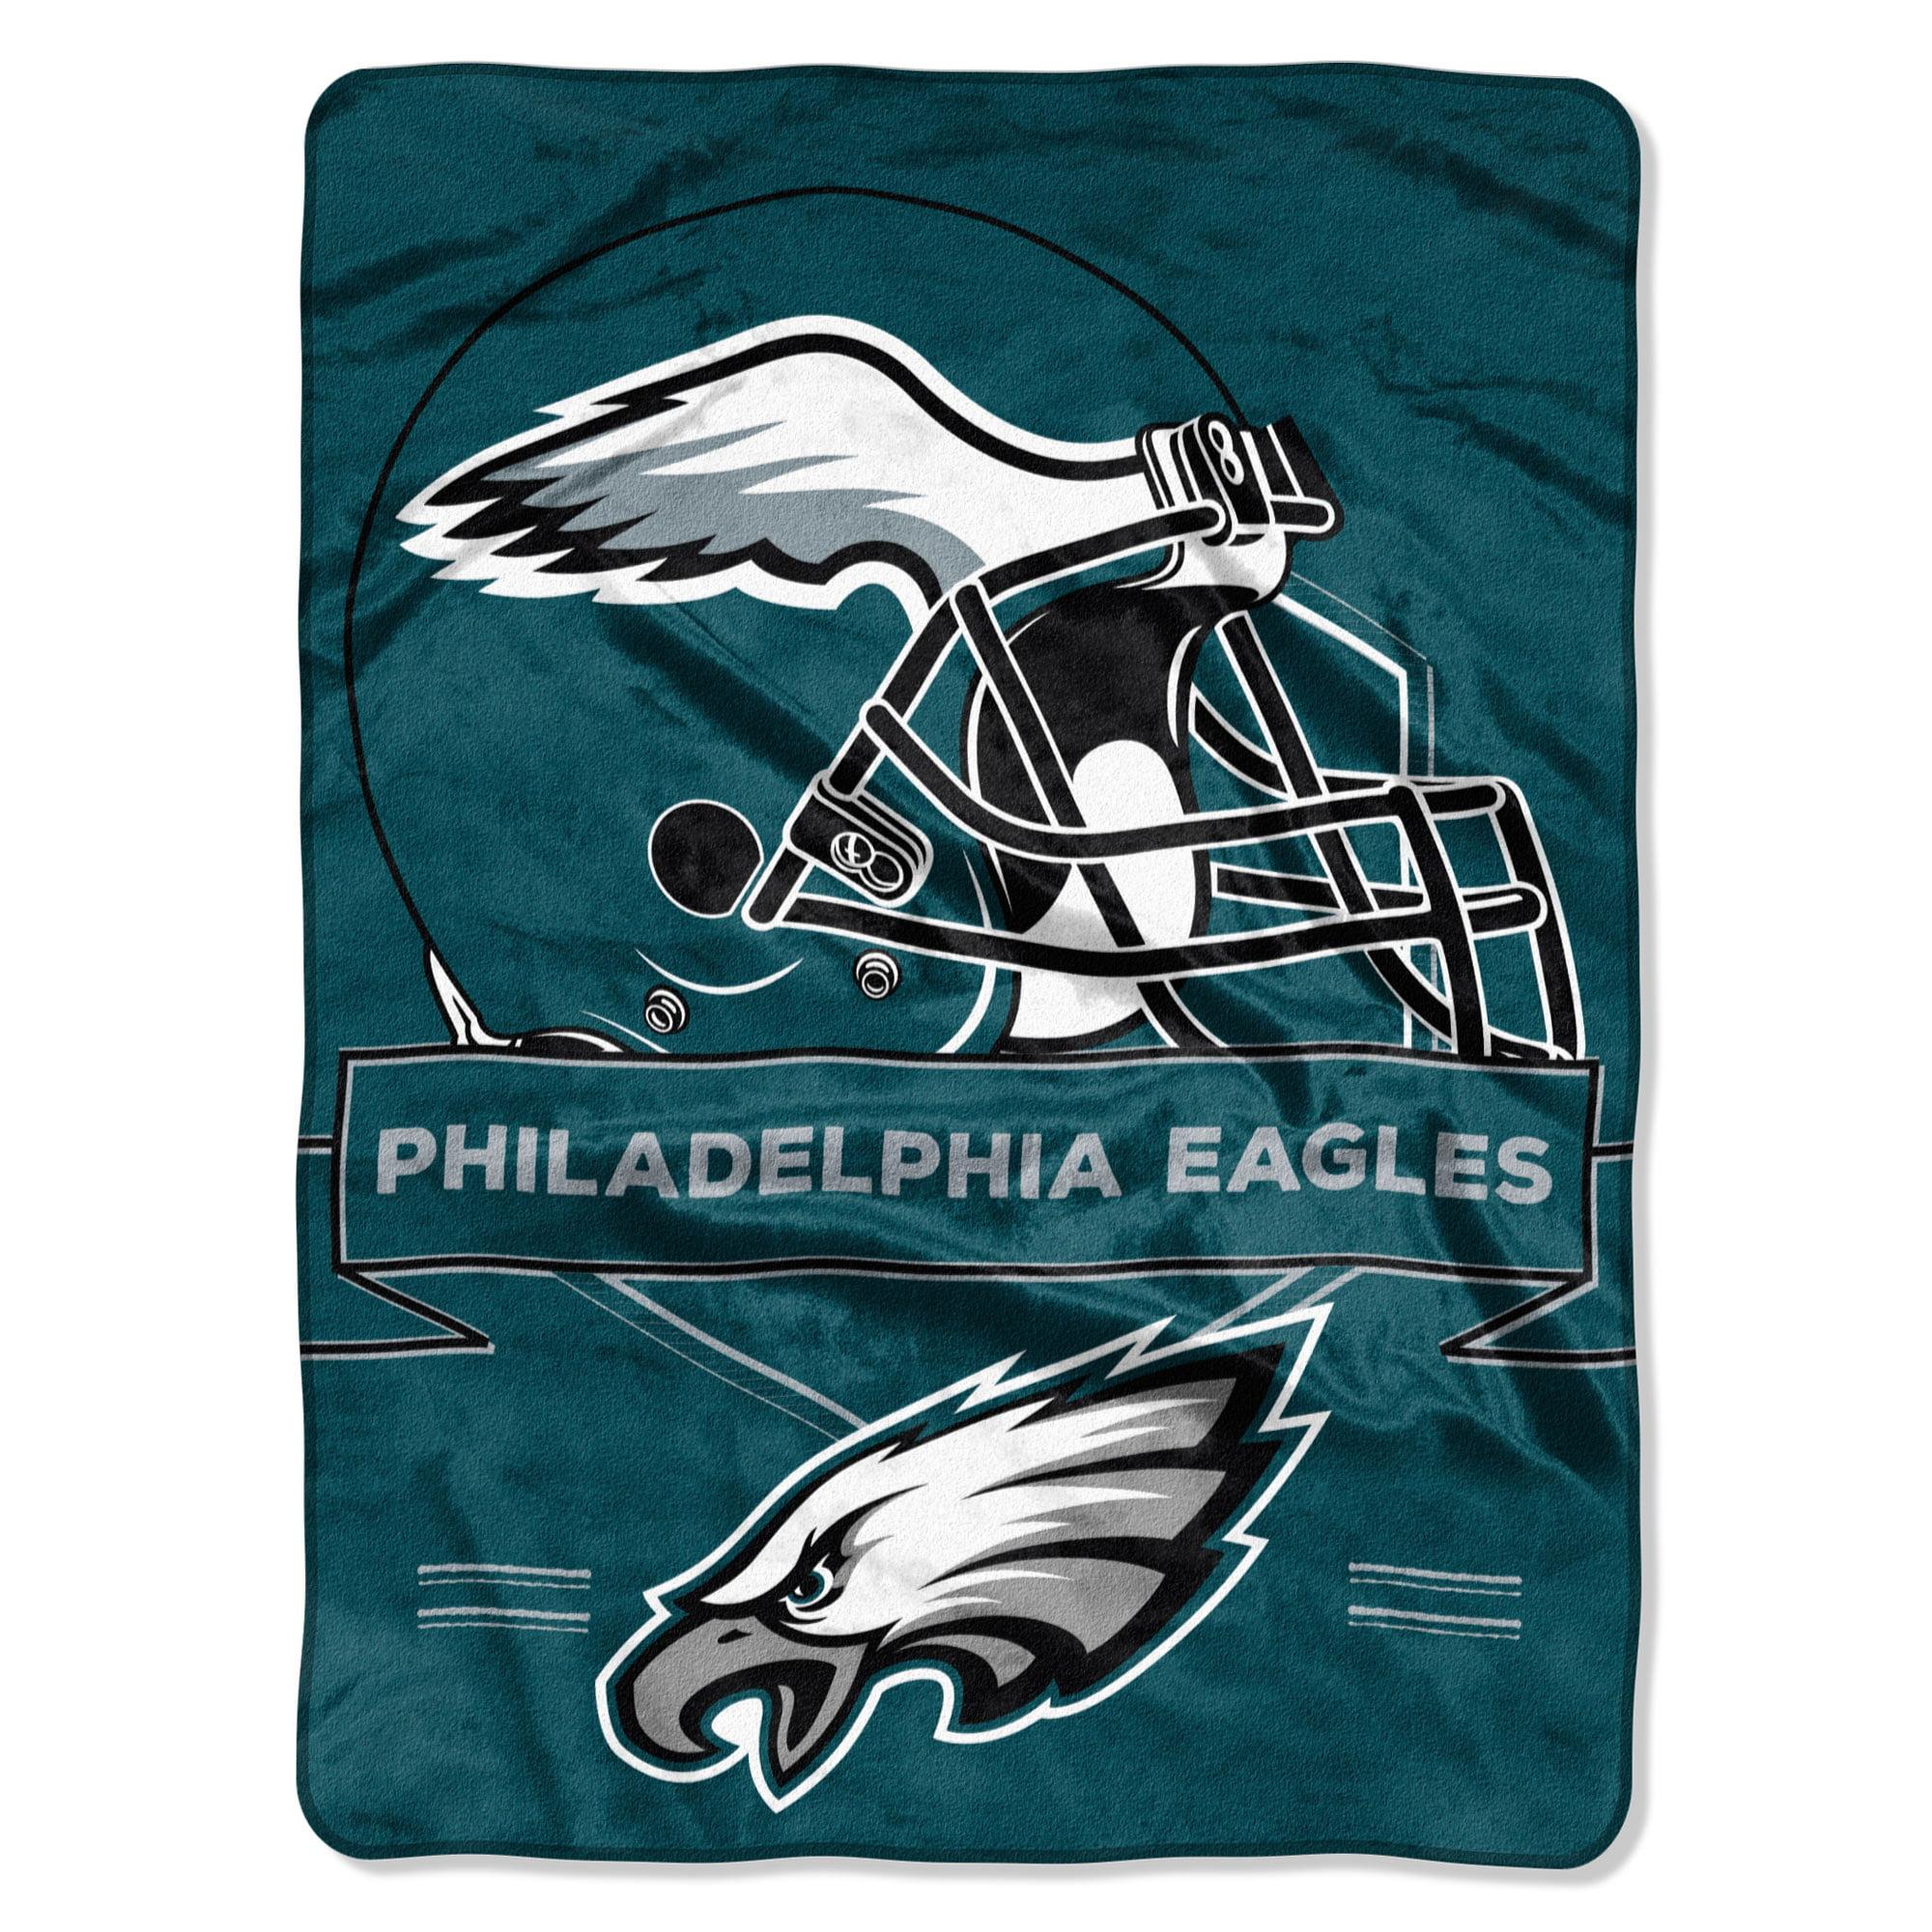 "Philadelphia Eagles The Northwest Company 60"" x 80"" Prestige Raschel Blanket - No Size"